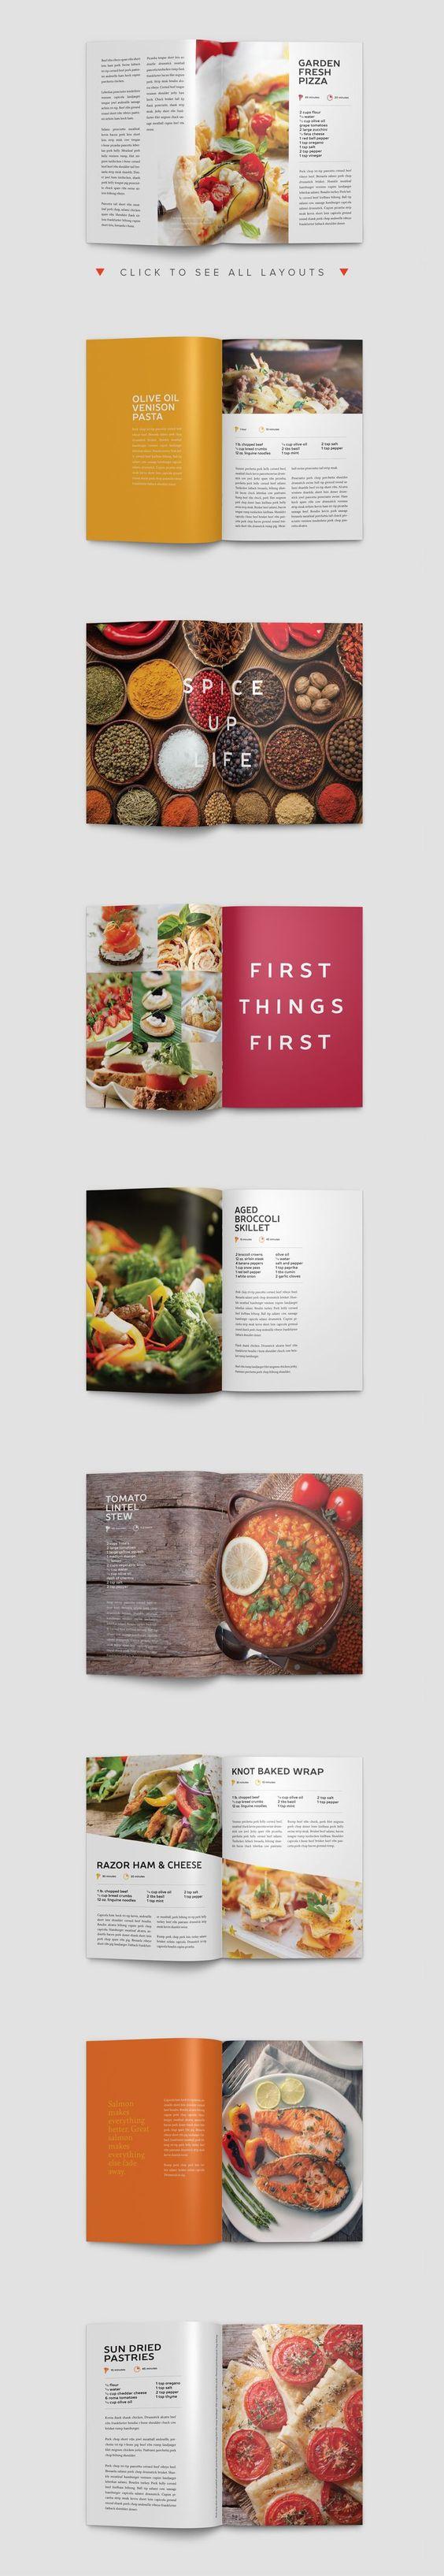 modern cookbook indesign template creative finals and overalls. Black Bedroom Furniture Sets. Home Design Ideas